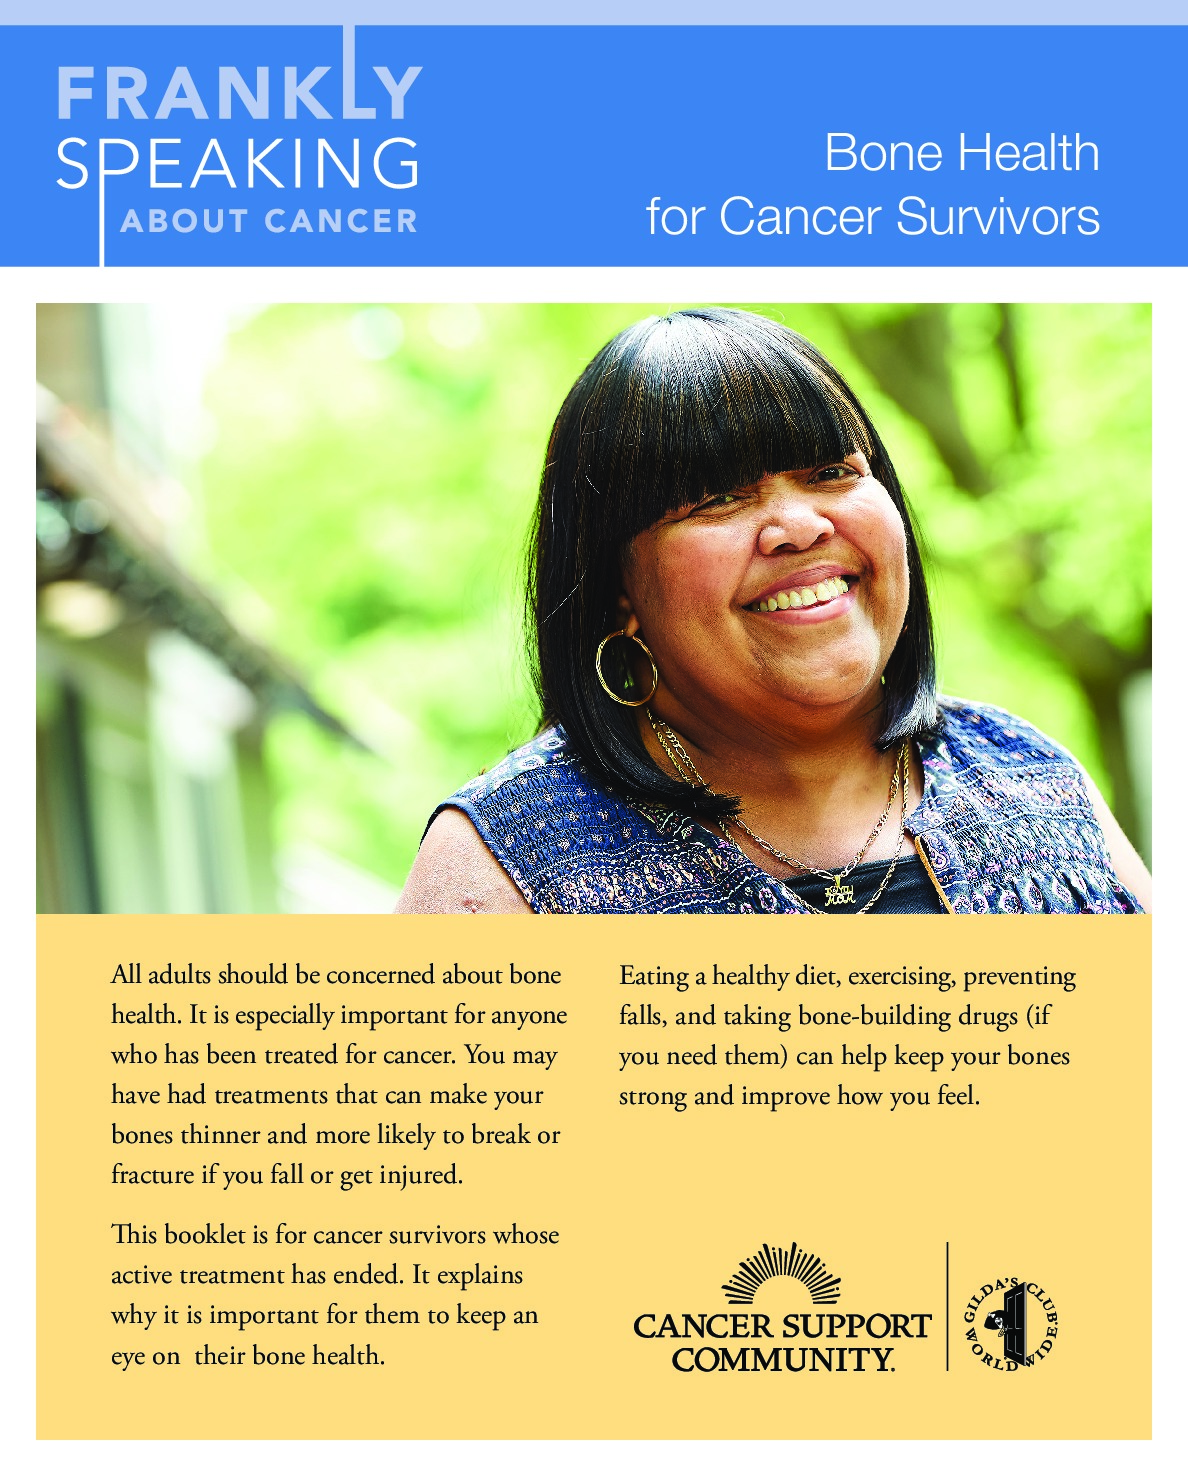 Frankly Speaking About Cancer: Bone Health for Cancer Survivors